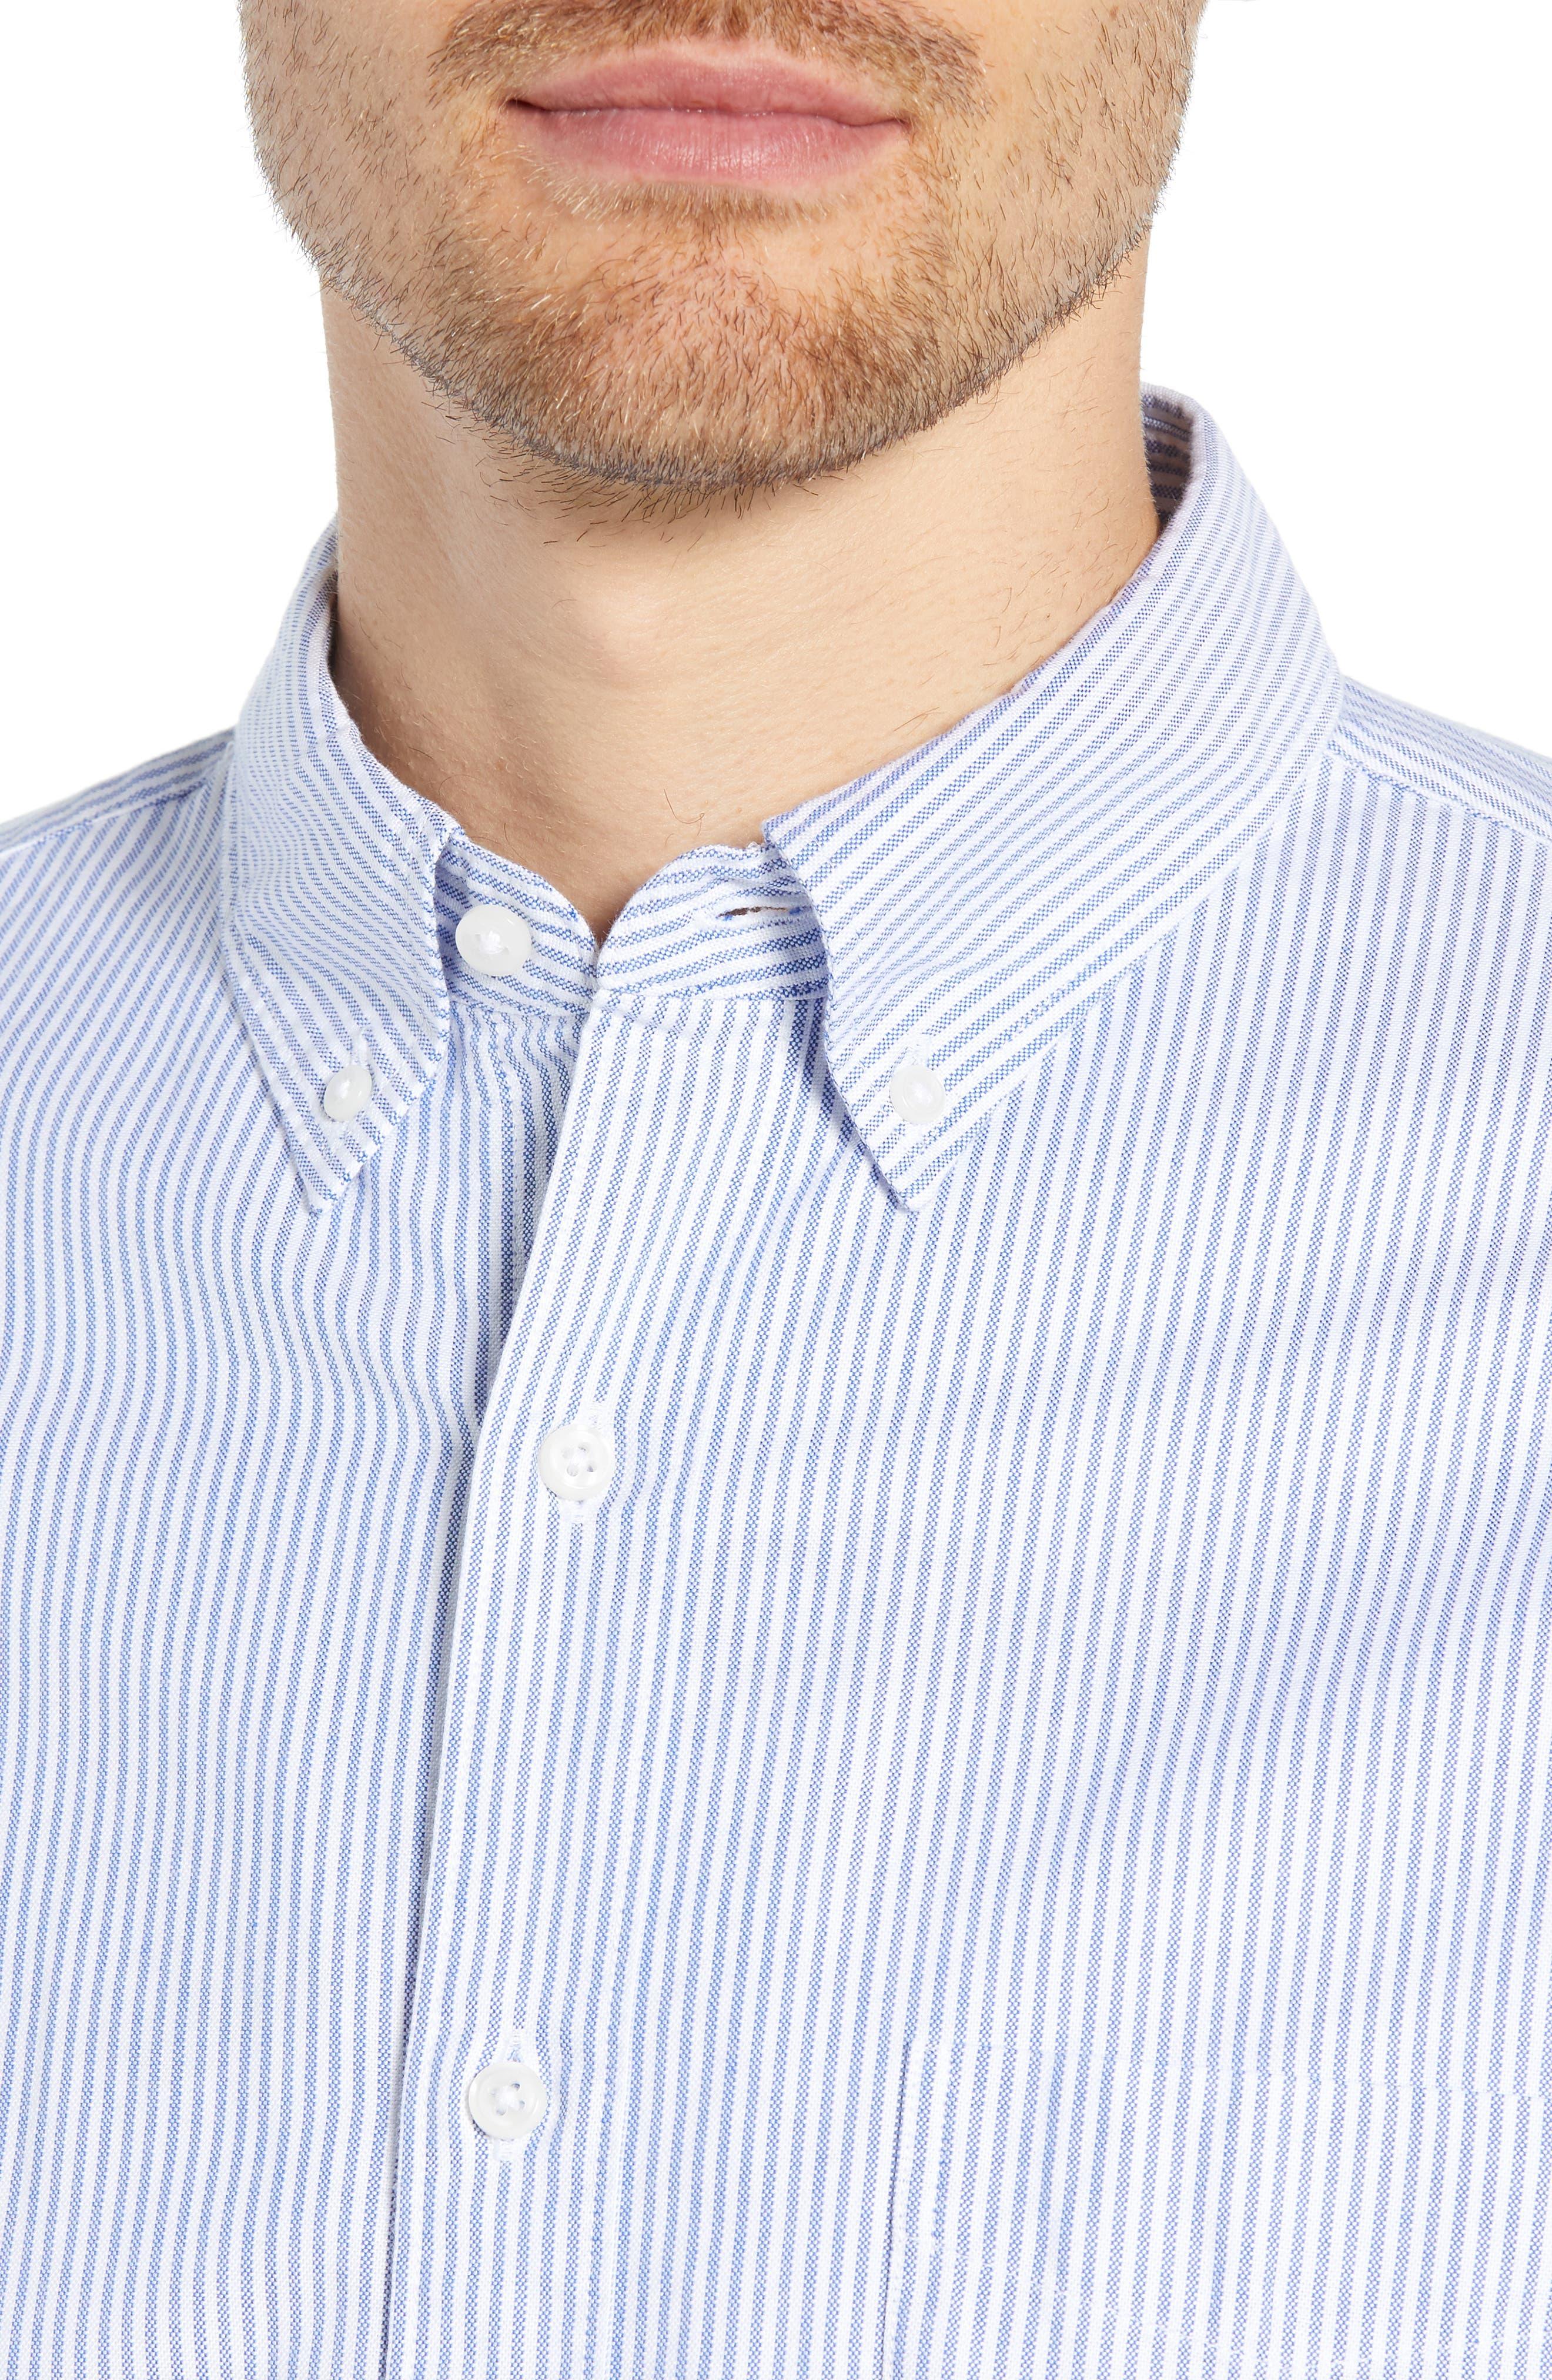 Stripe Pima Cotton Oxford Sport Shirt,                             Alternate thumbnail 2, color,                             RAINCOAT BLUE